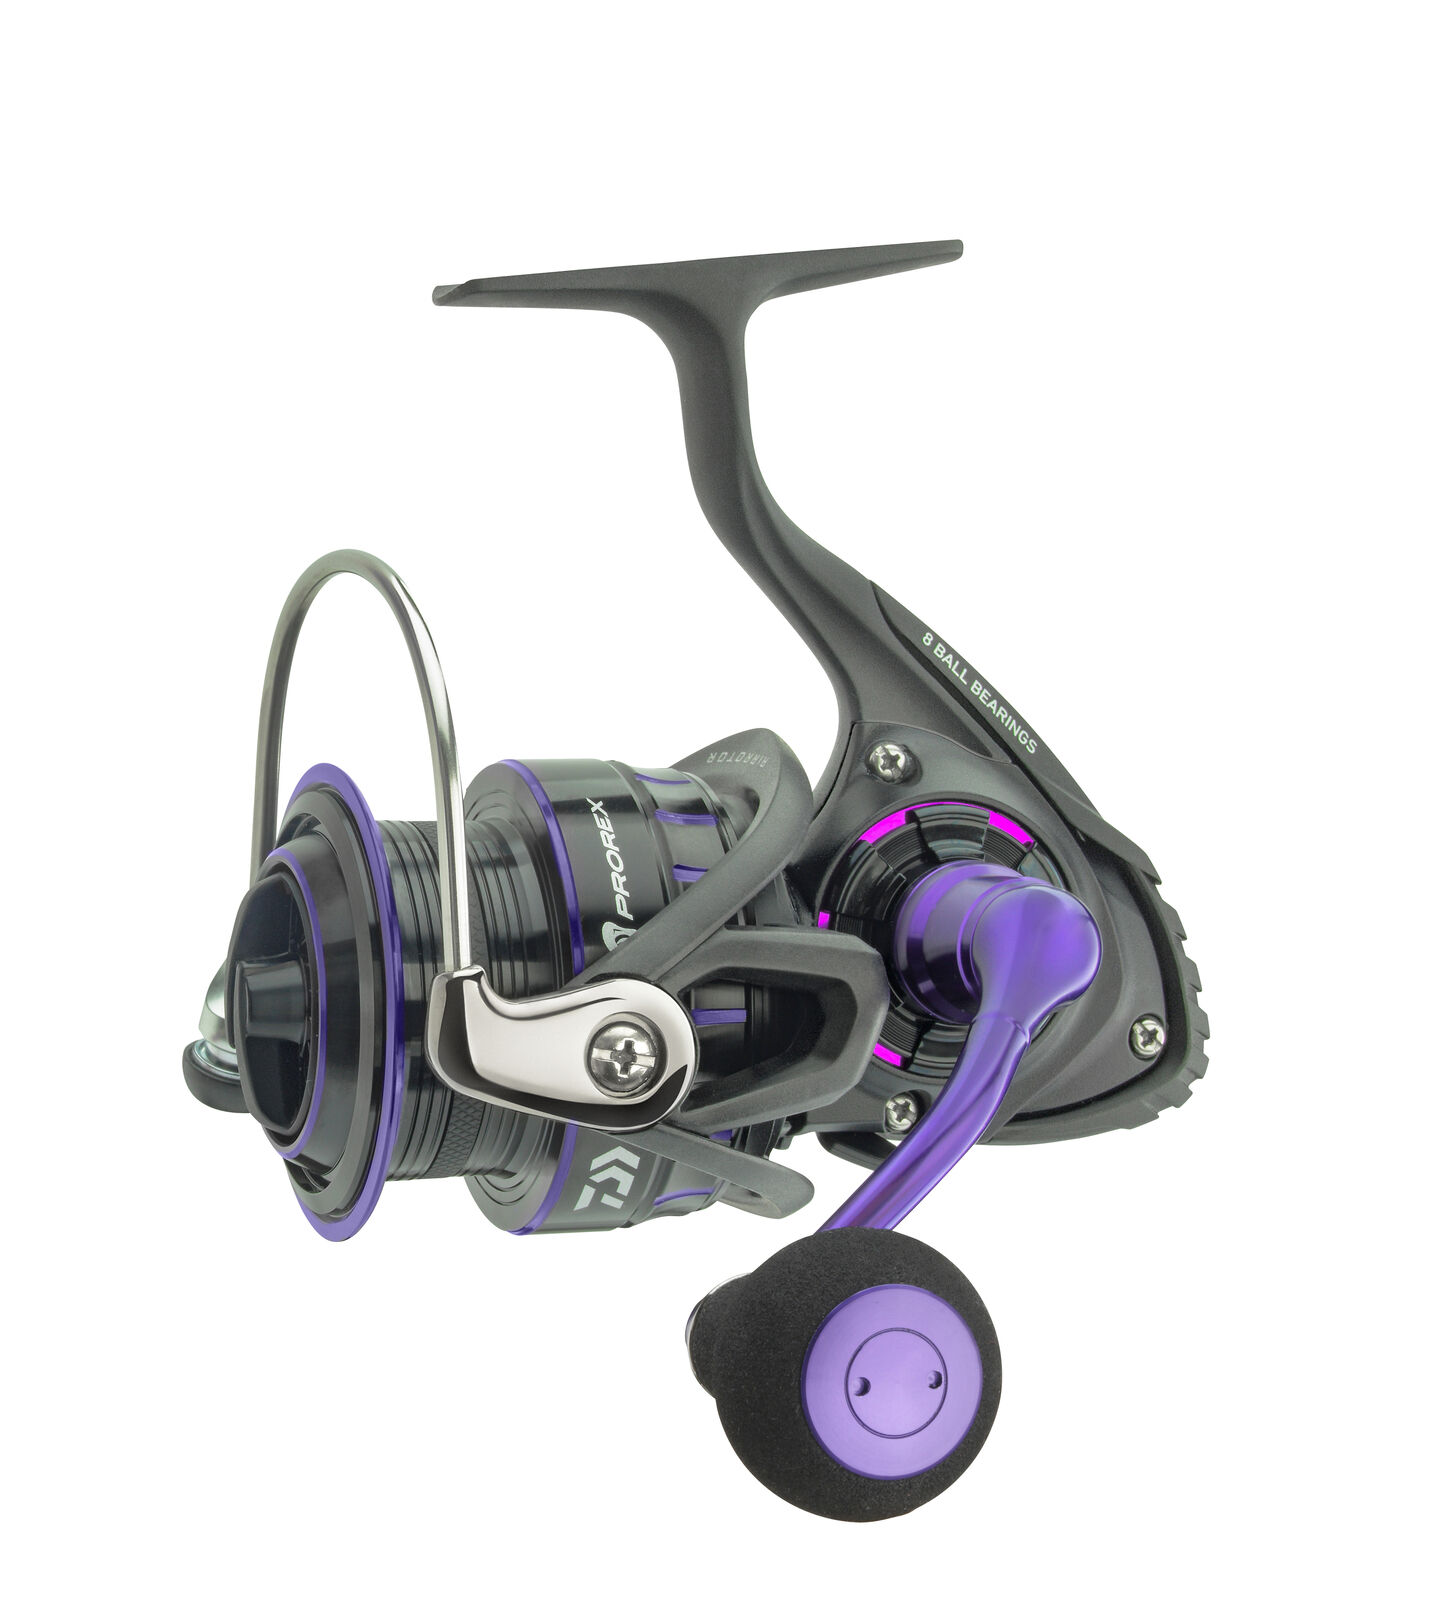 Daiwa Prorex XR Spinning Reel